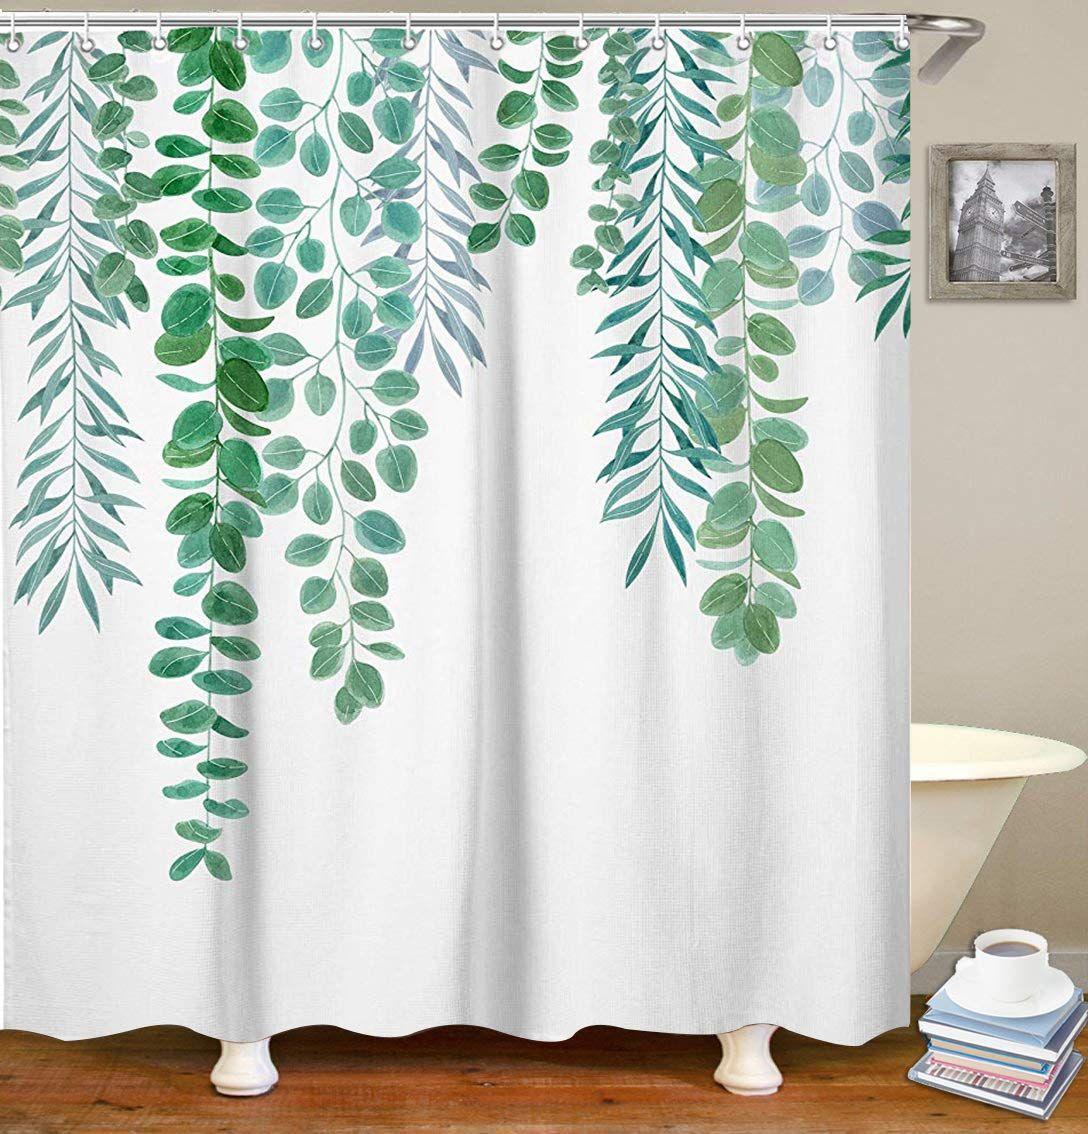 Livilan Green Leaf Shower Curtain Set With 12 Hooks Decorative